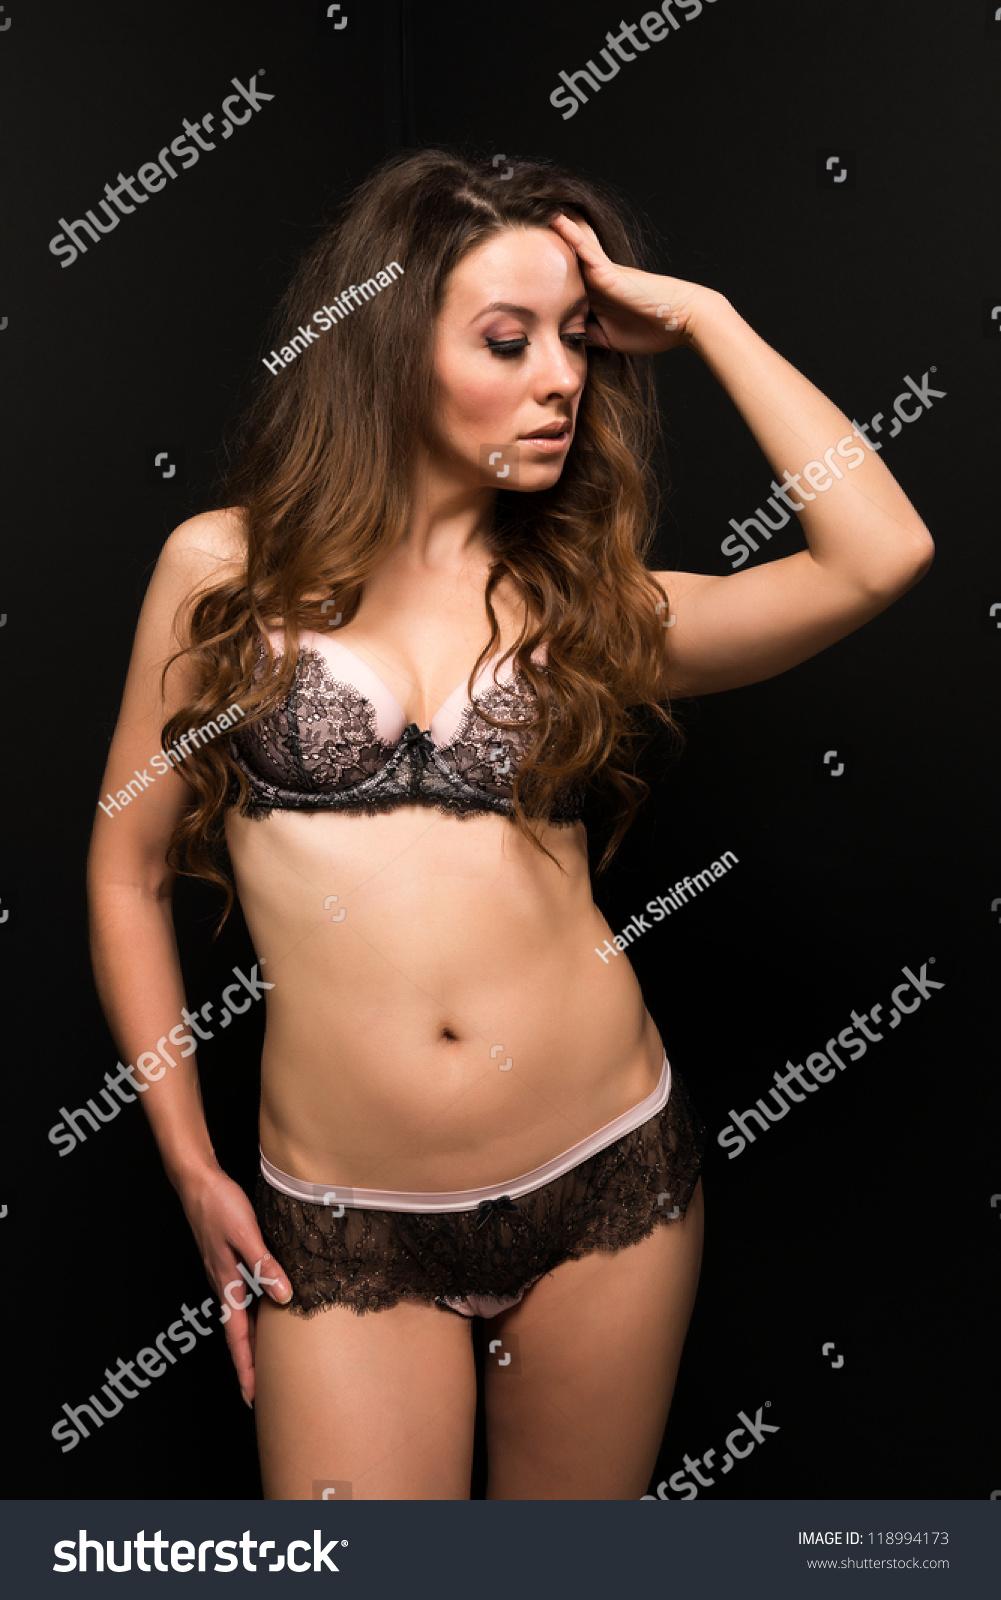 Men bikini nude moldovan woman girls naked pussy